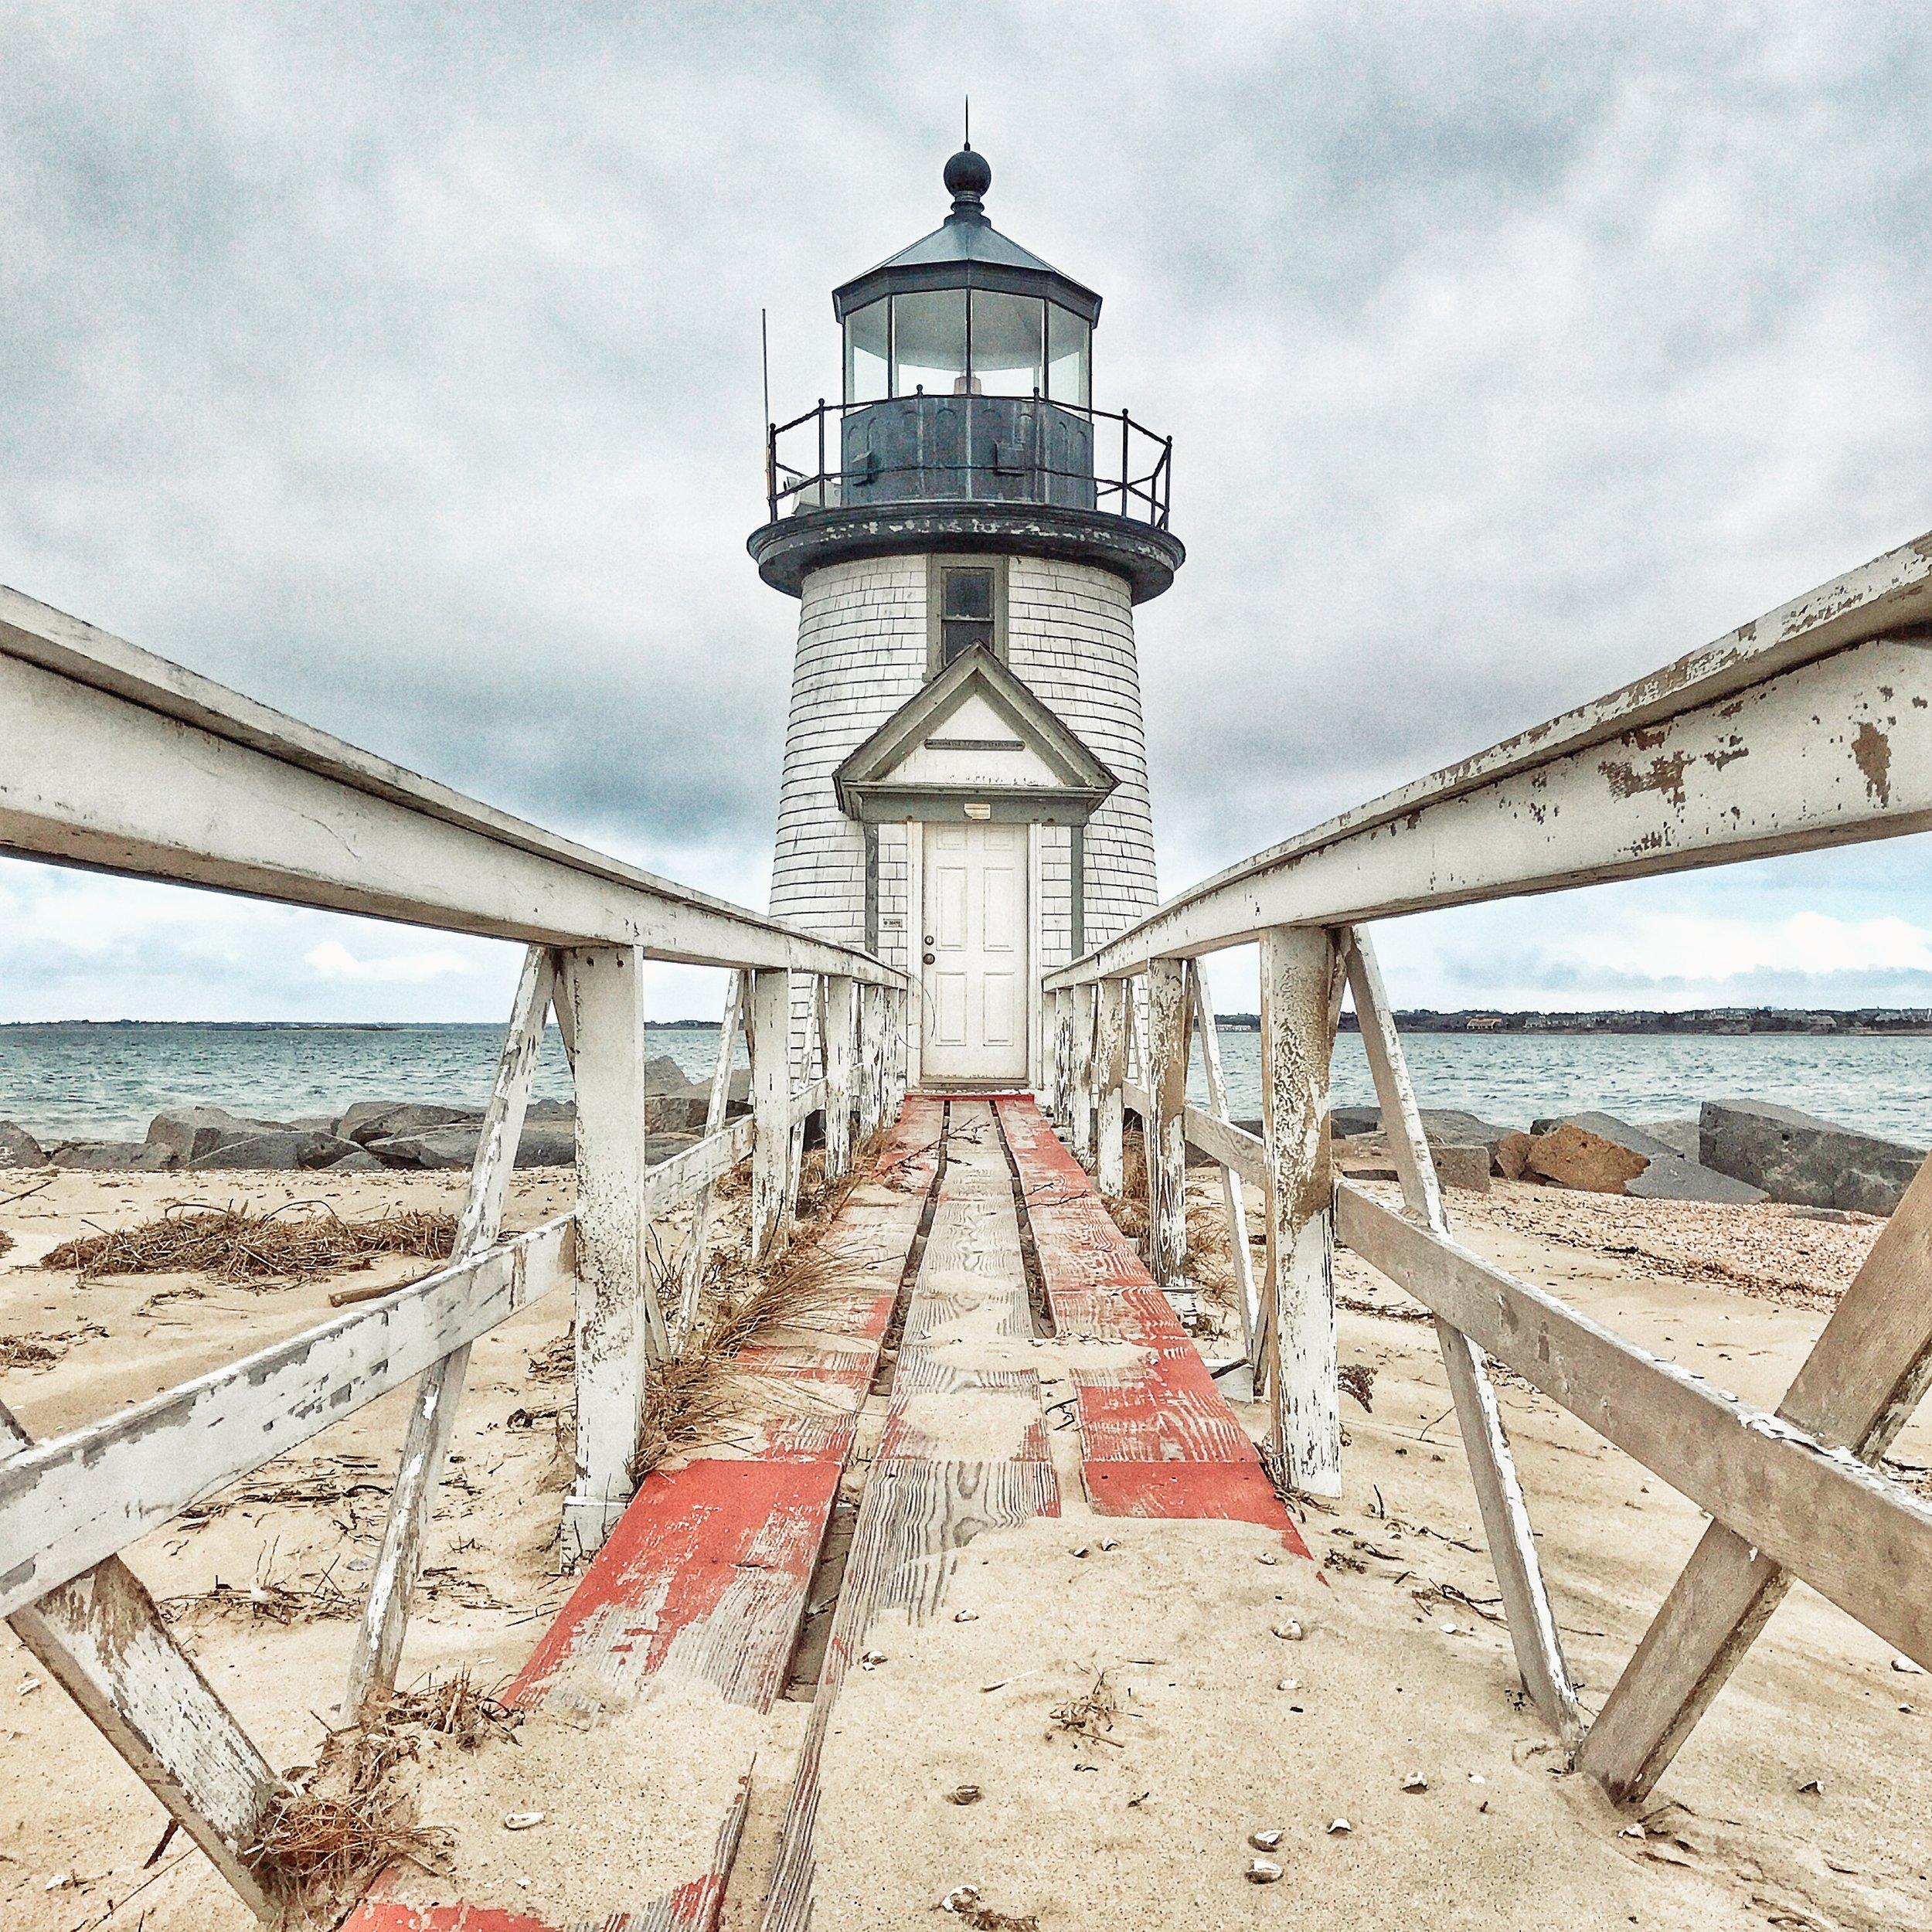 @jennysiphoneography - Nantucket, MA